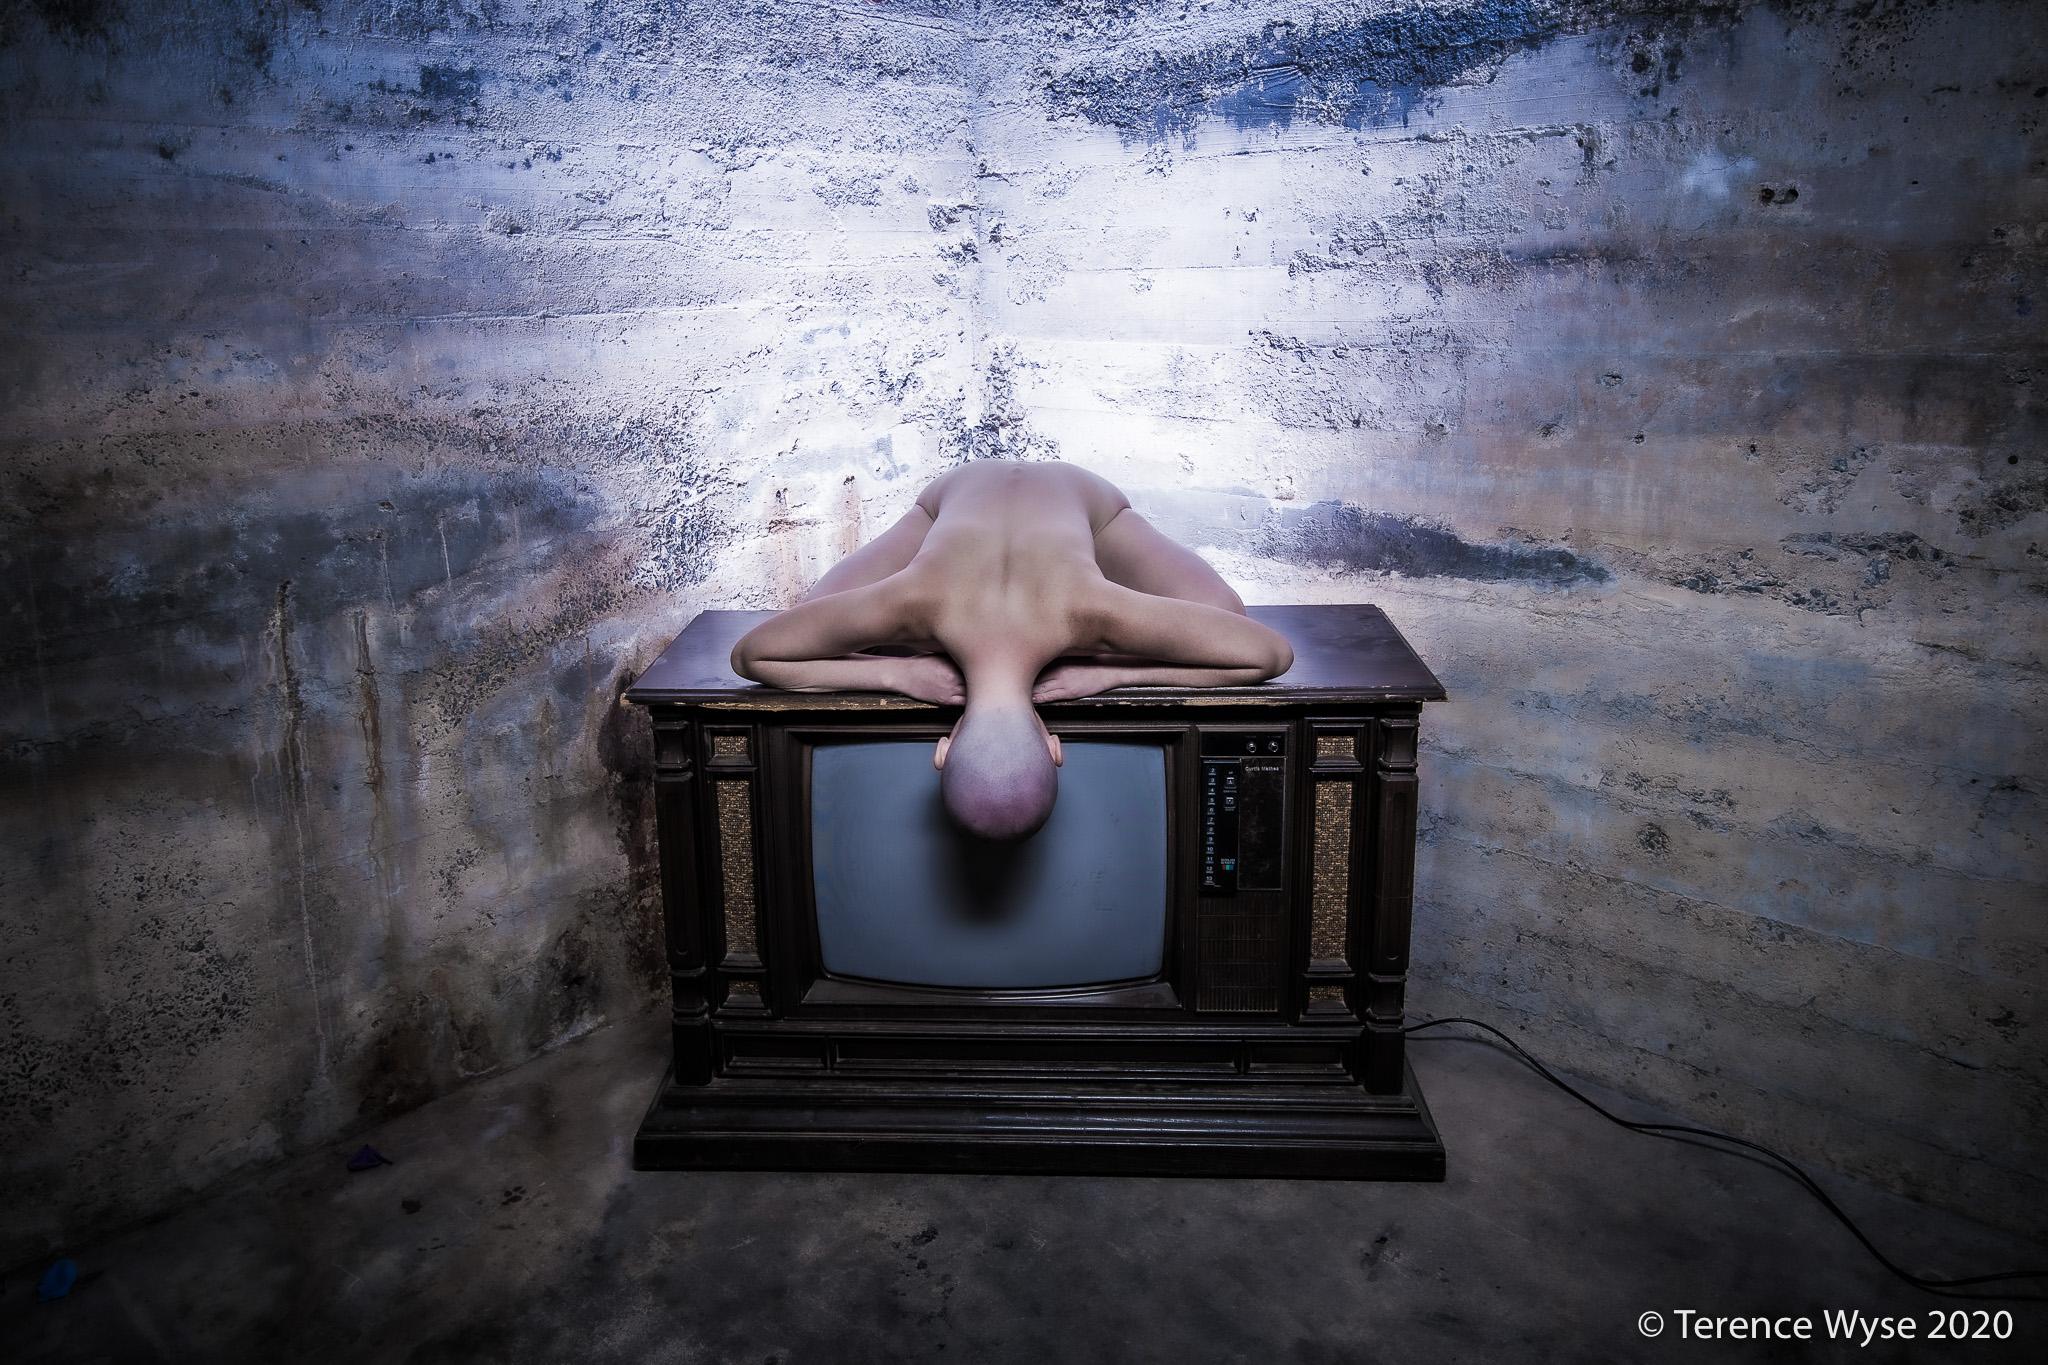 Photographer: Terry Wyse